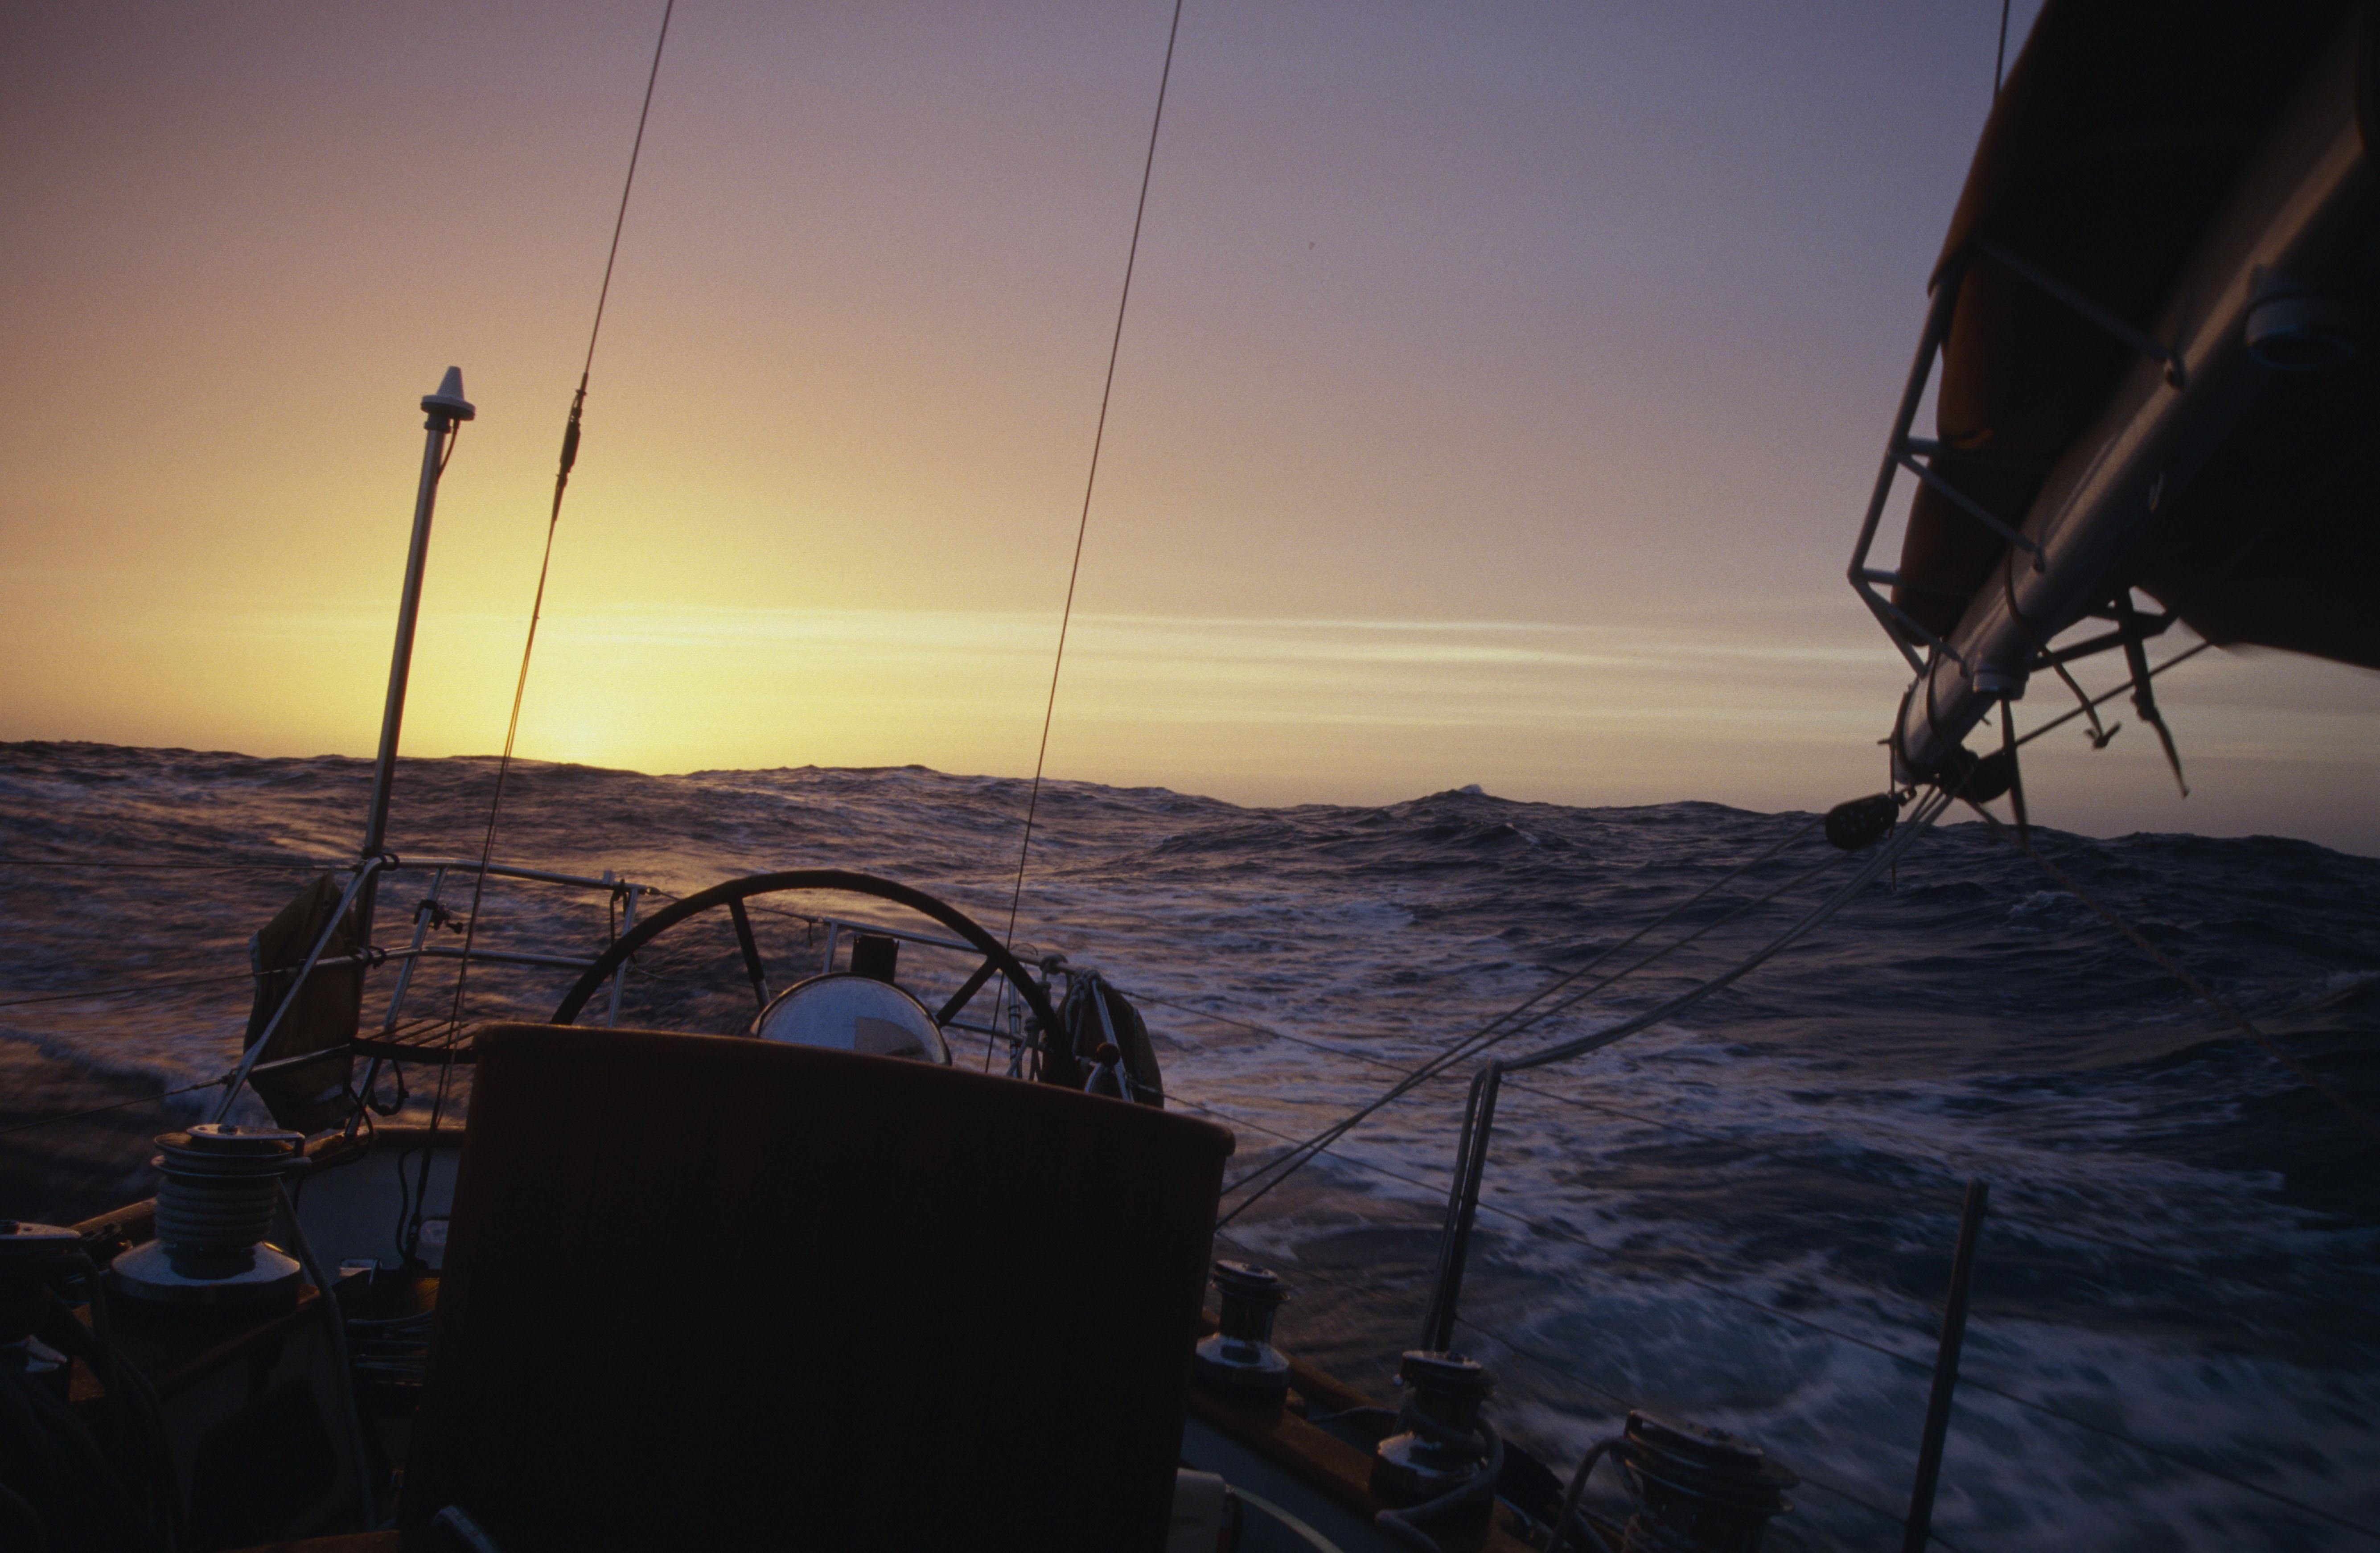 Maritimes Bild - martime picture